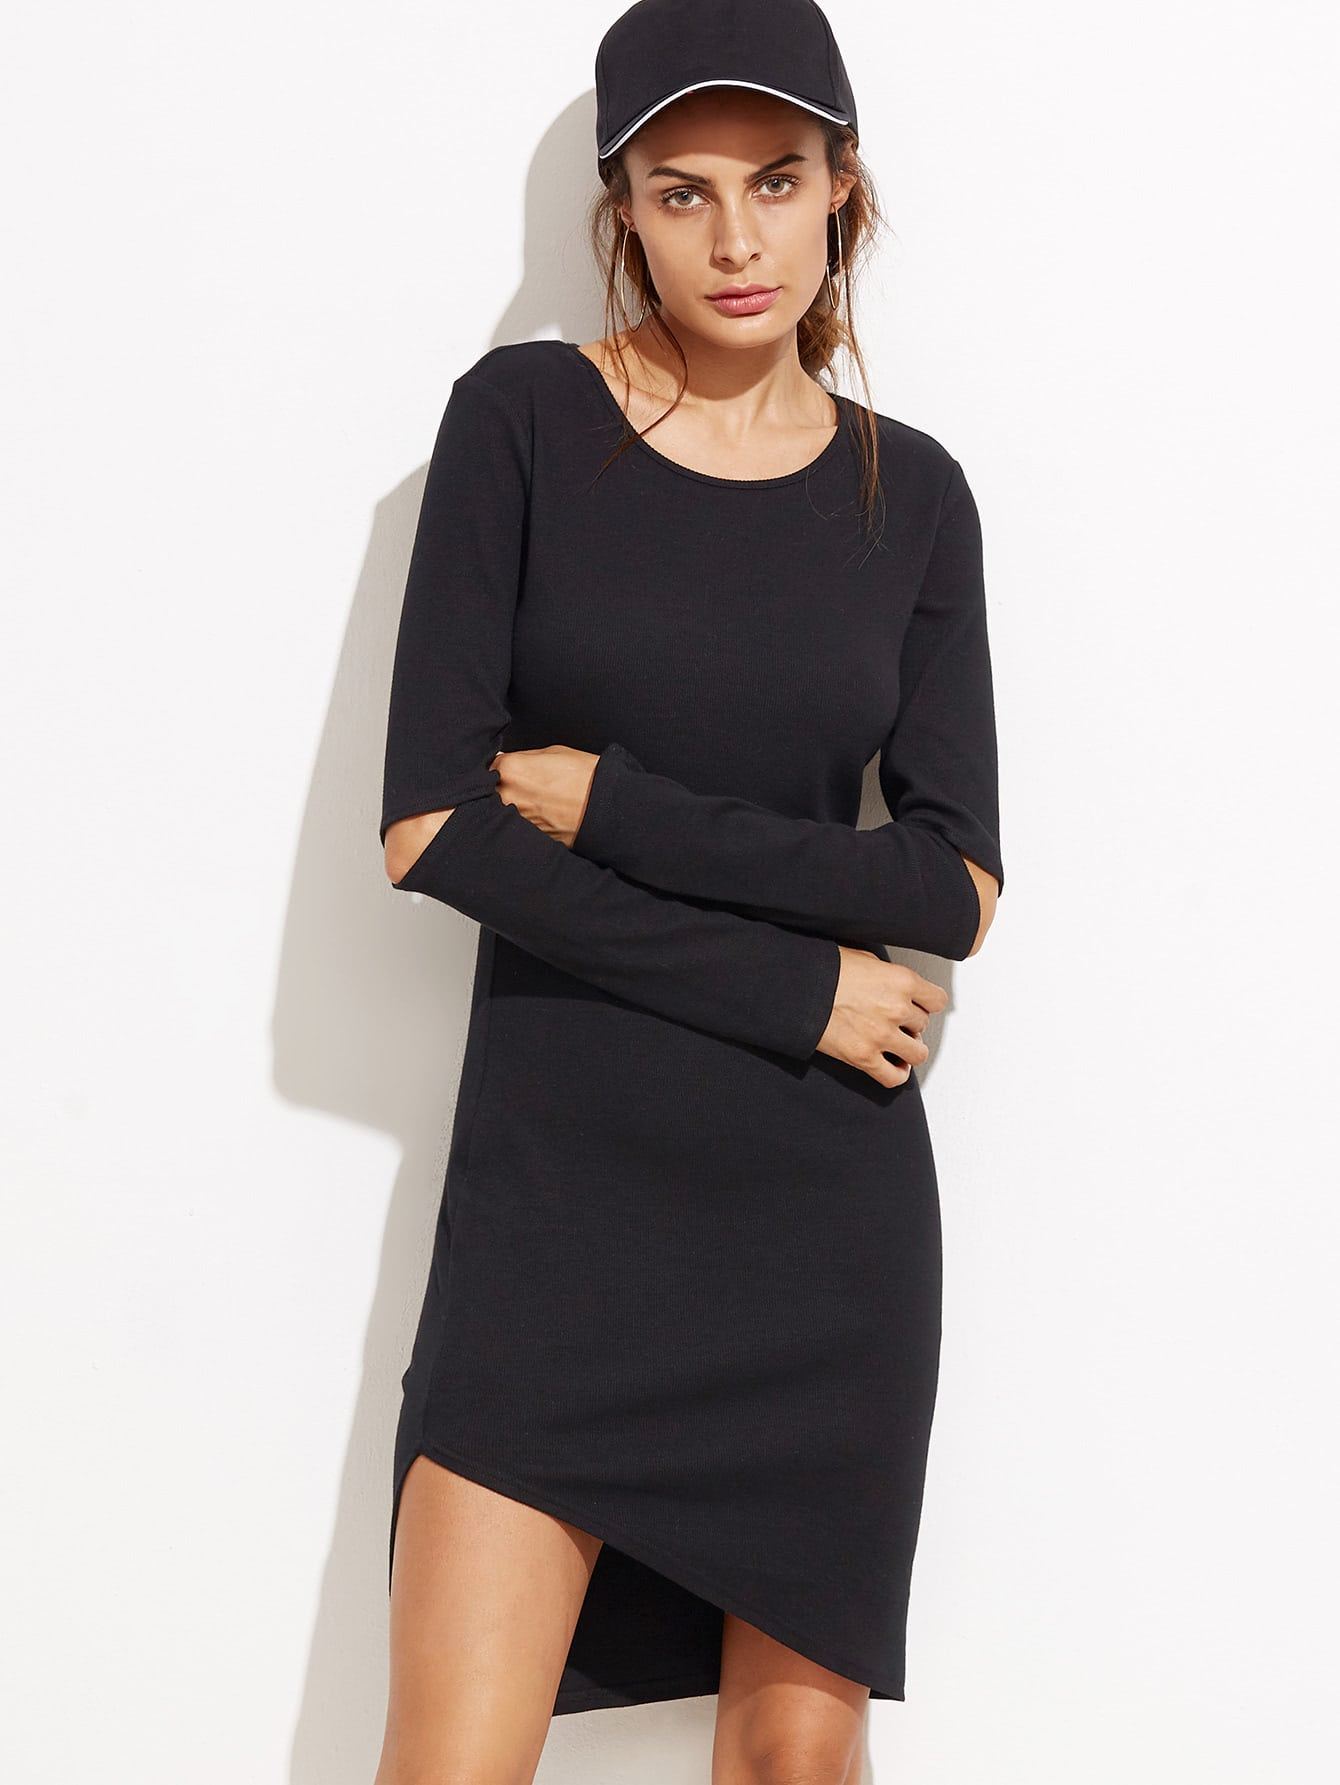 Black Cutout Elbow Asymmetric Dress dress160916701